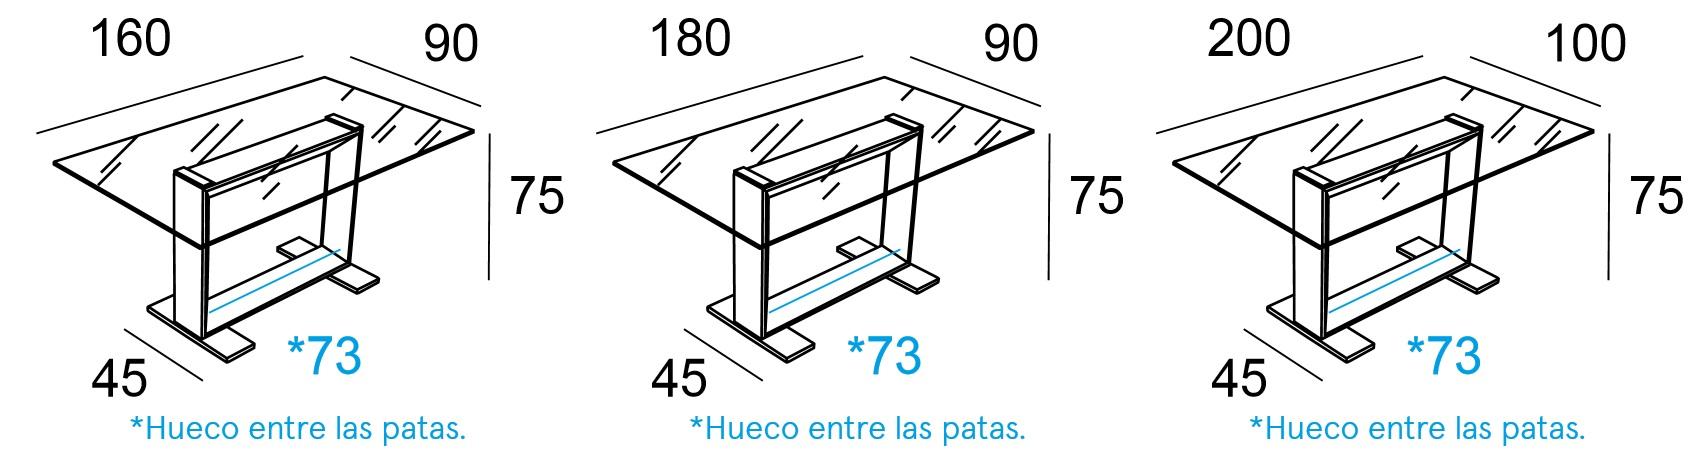 Mesa Comedor Estructura Cromada Modelo Kubic | Mubeko